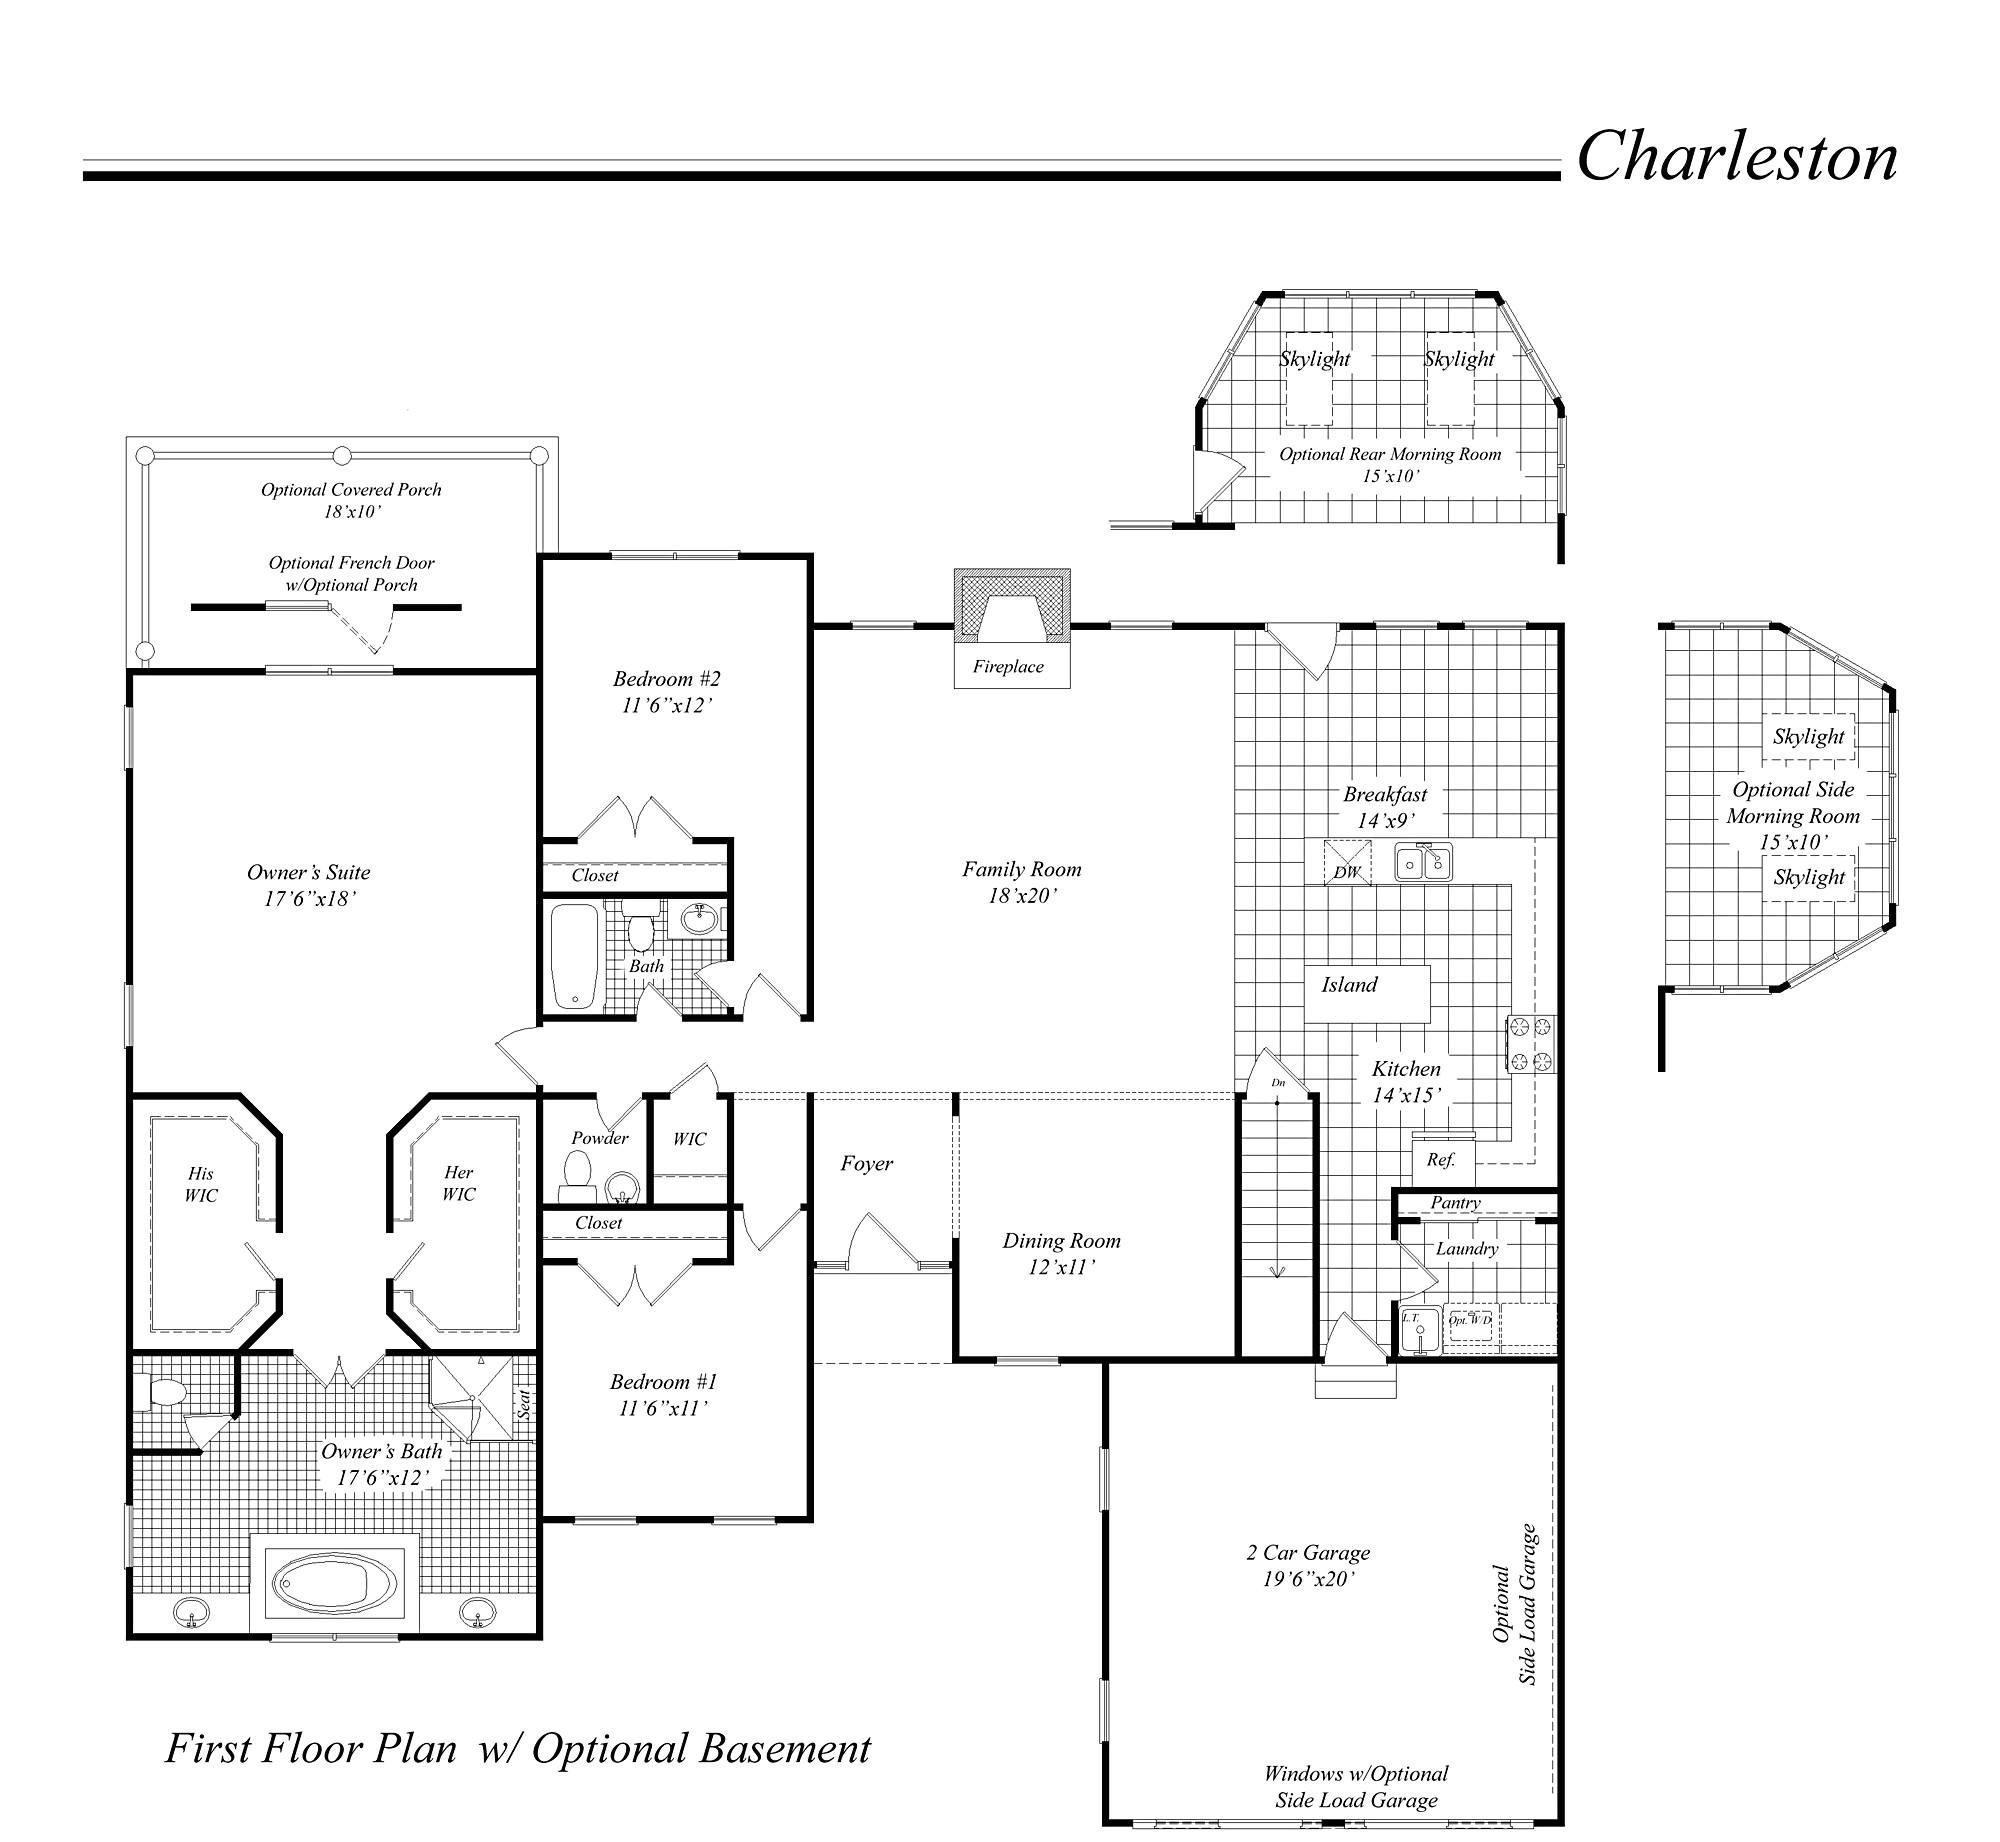 20 elegant oak creek homes floor plans oak creek homes floor plans lovely oak creek homes